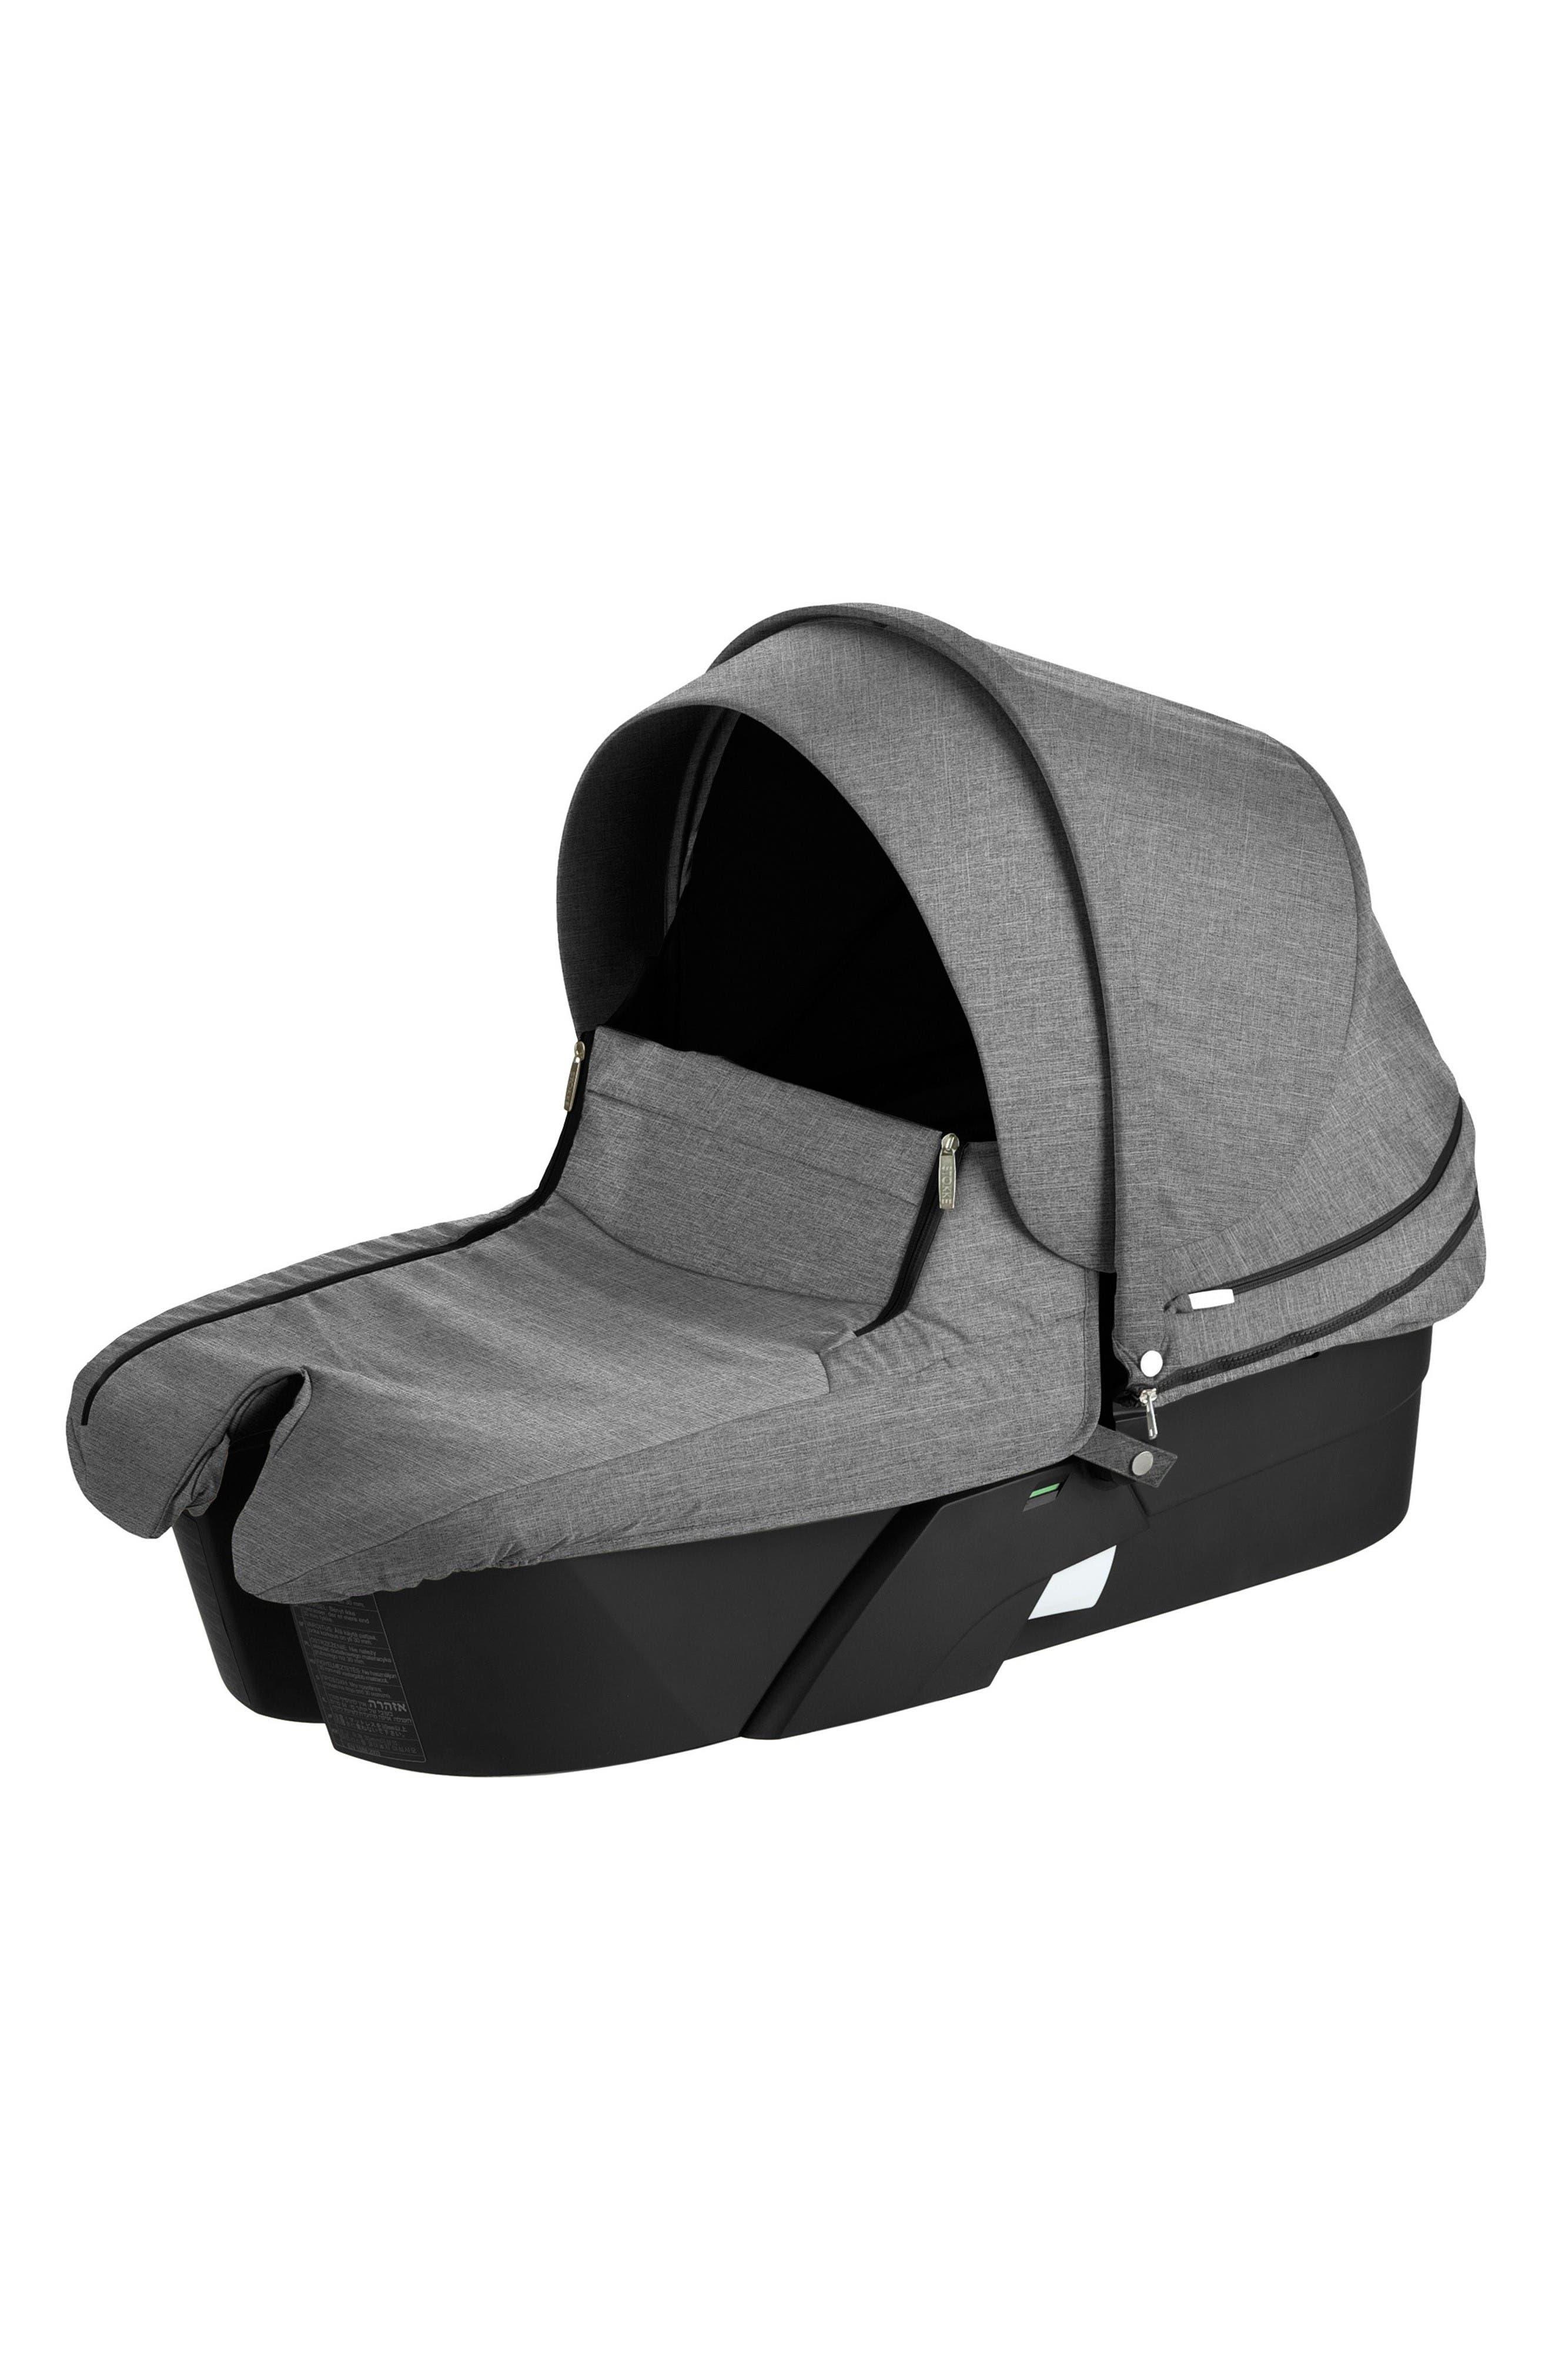 Alternate Image 1 Selected - Stokke Xplory® Stroller Carry Cot